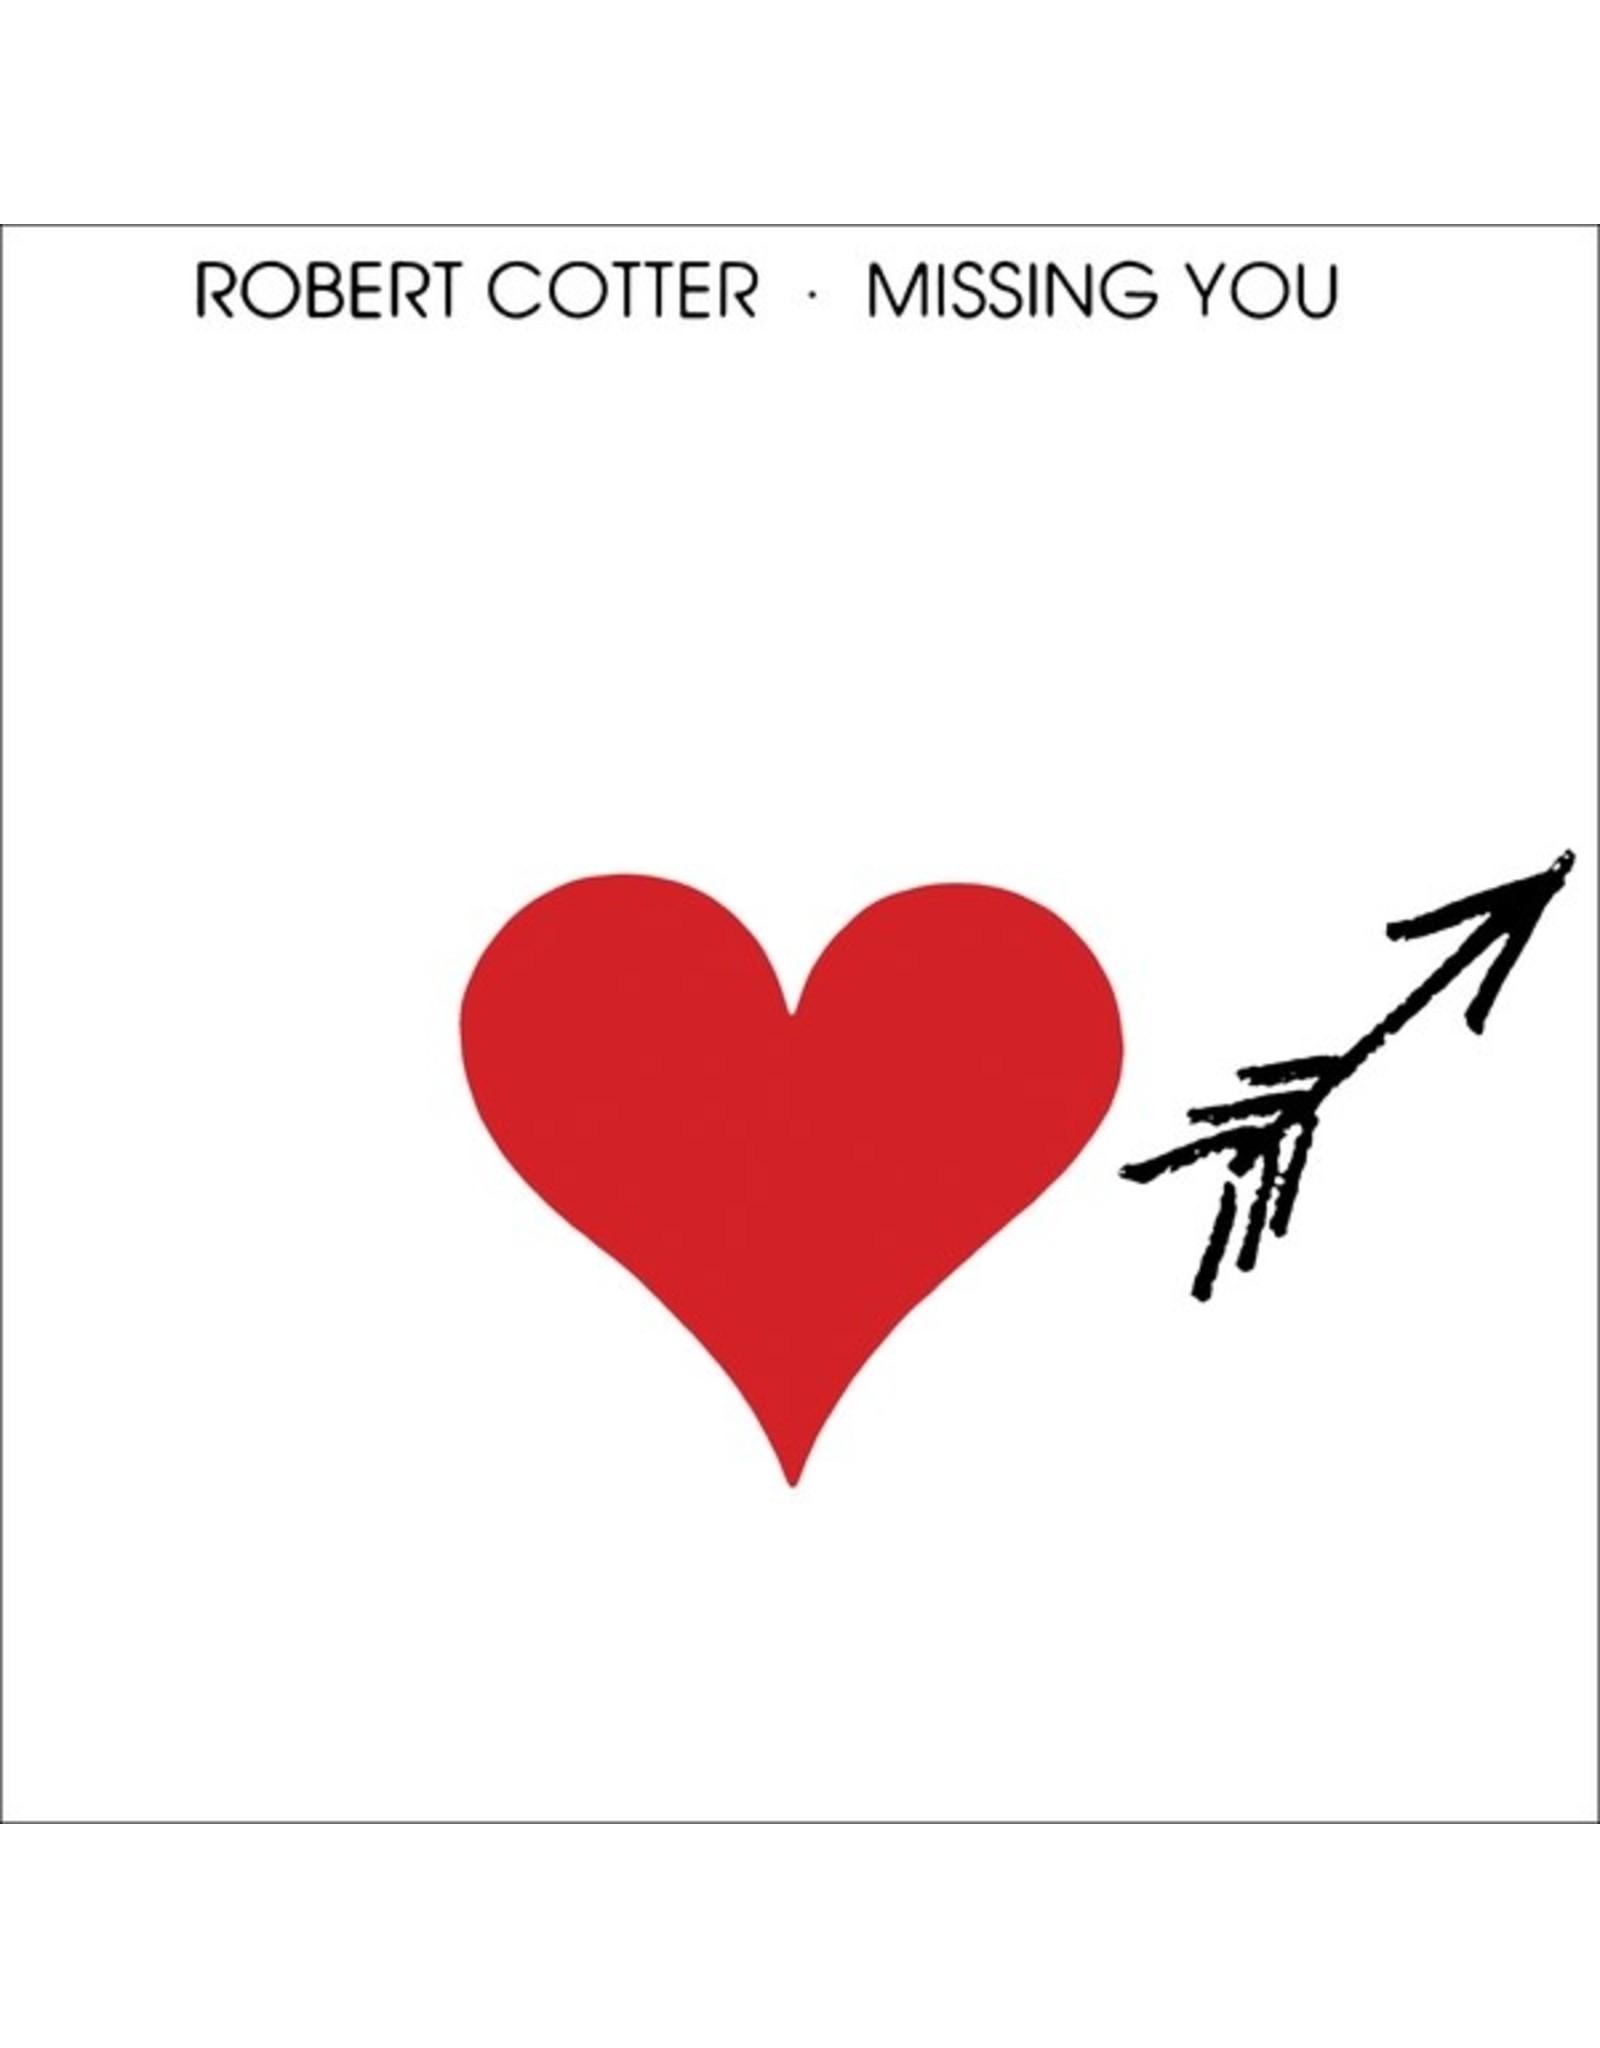 New Vinyl Robert Cotter - Missing You LP